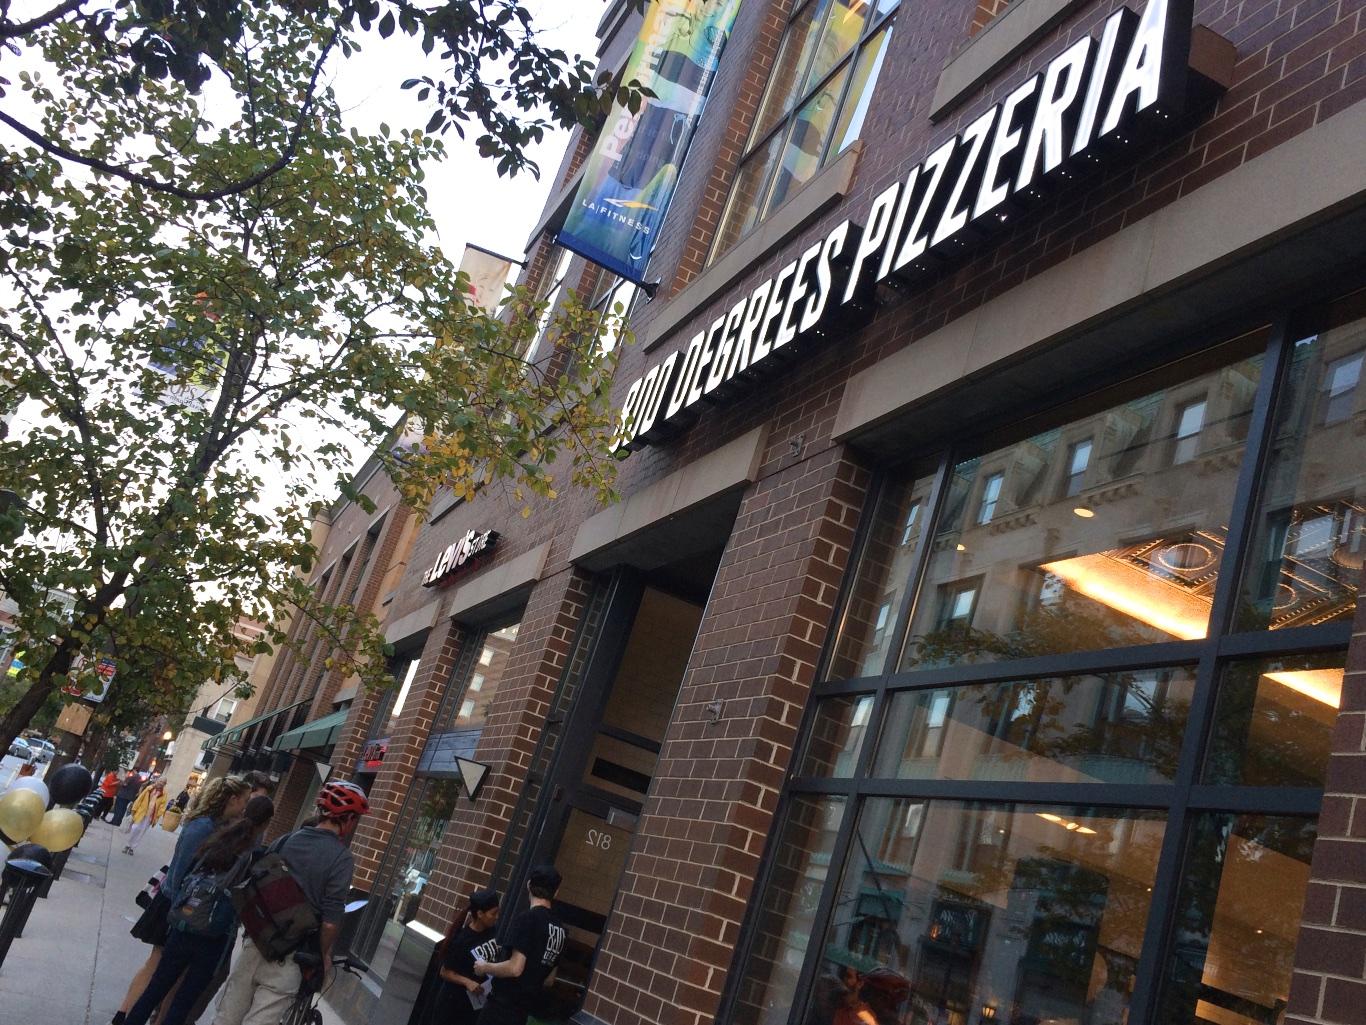 800 Degrees Pizza, 812 Church St, Evanston, IL